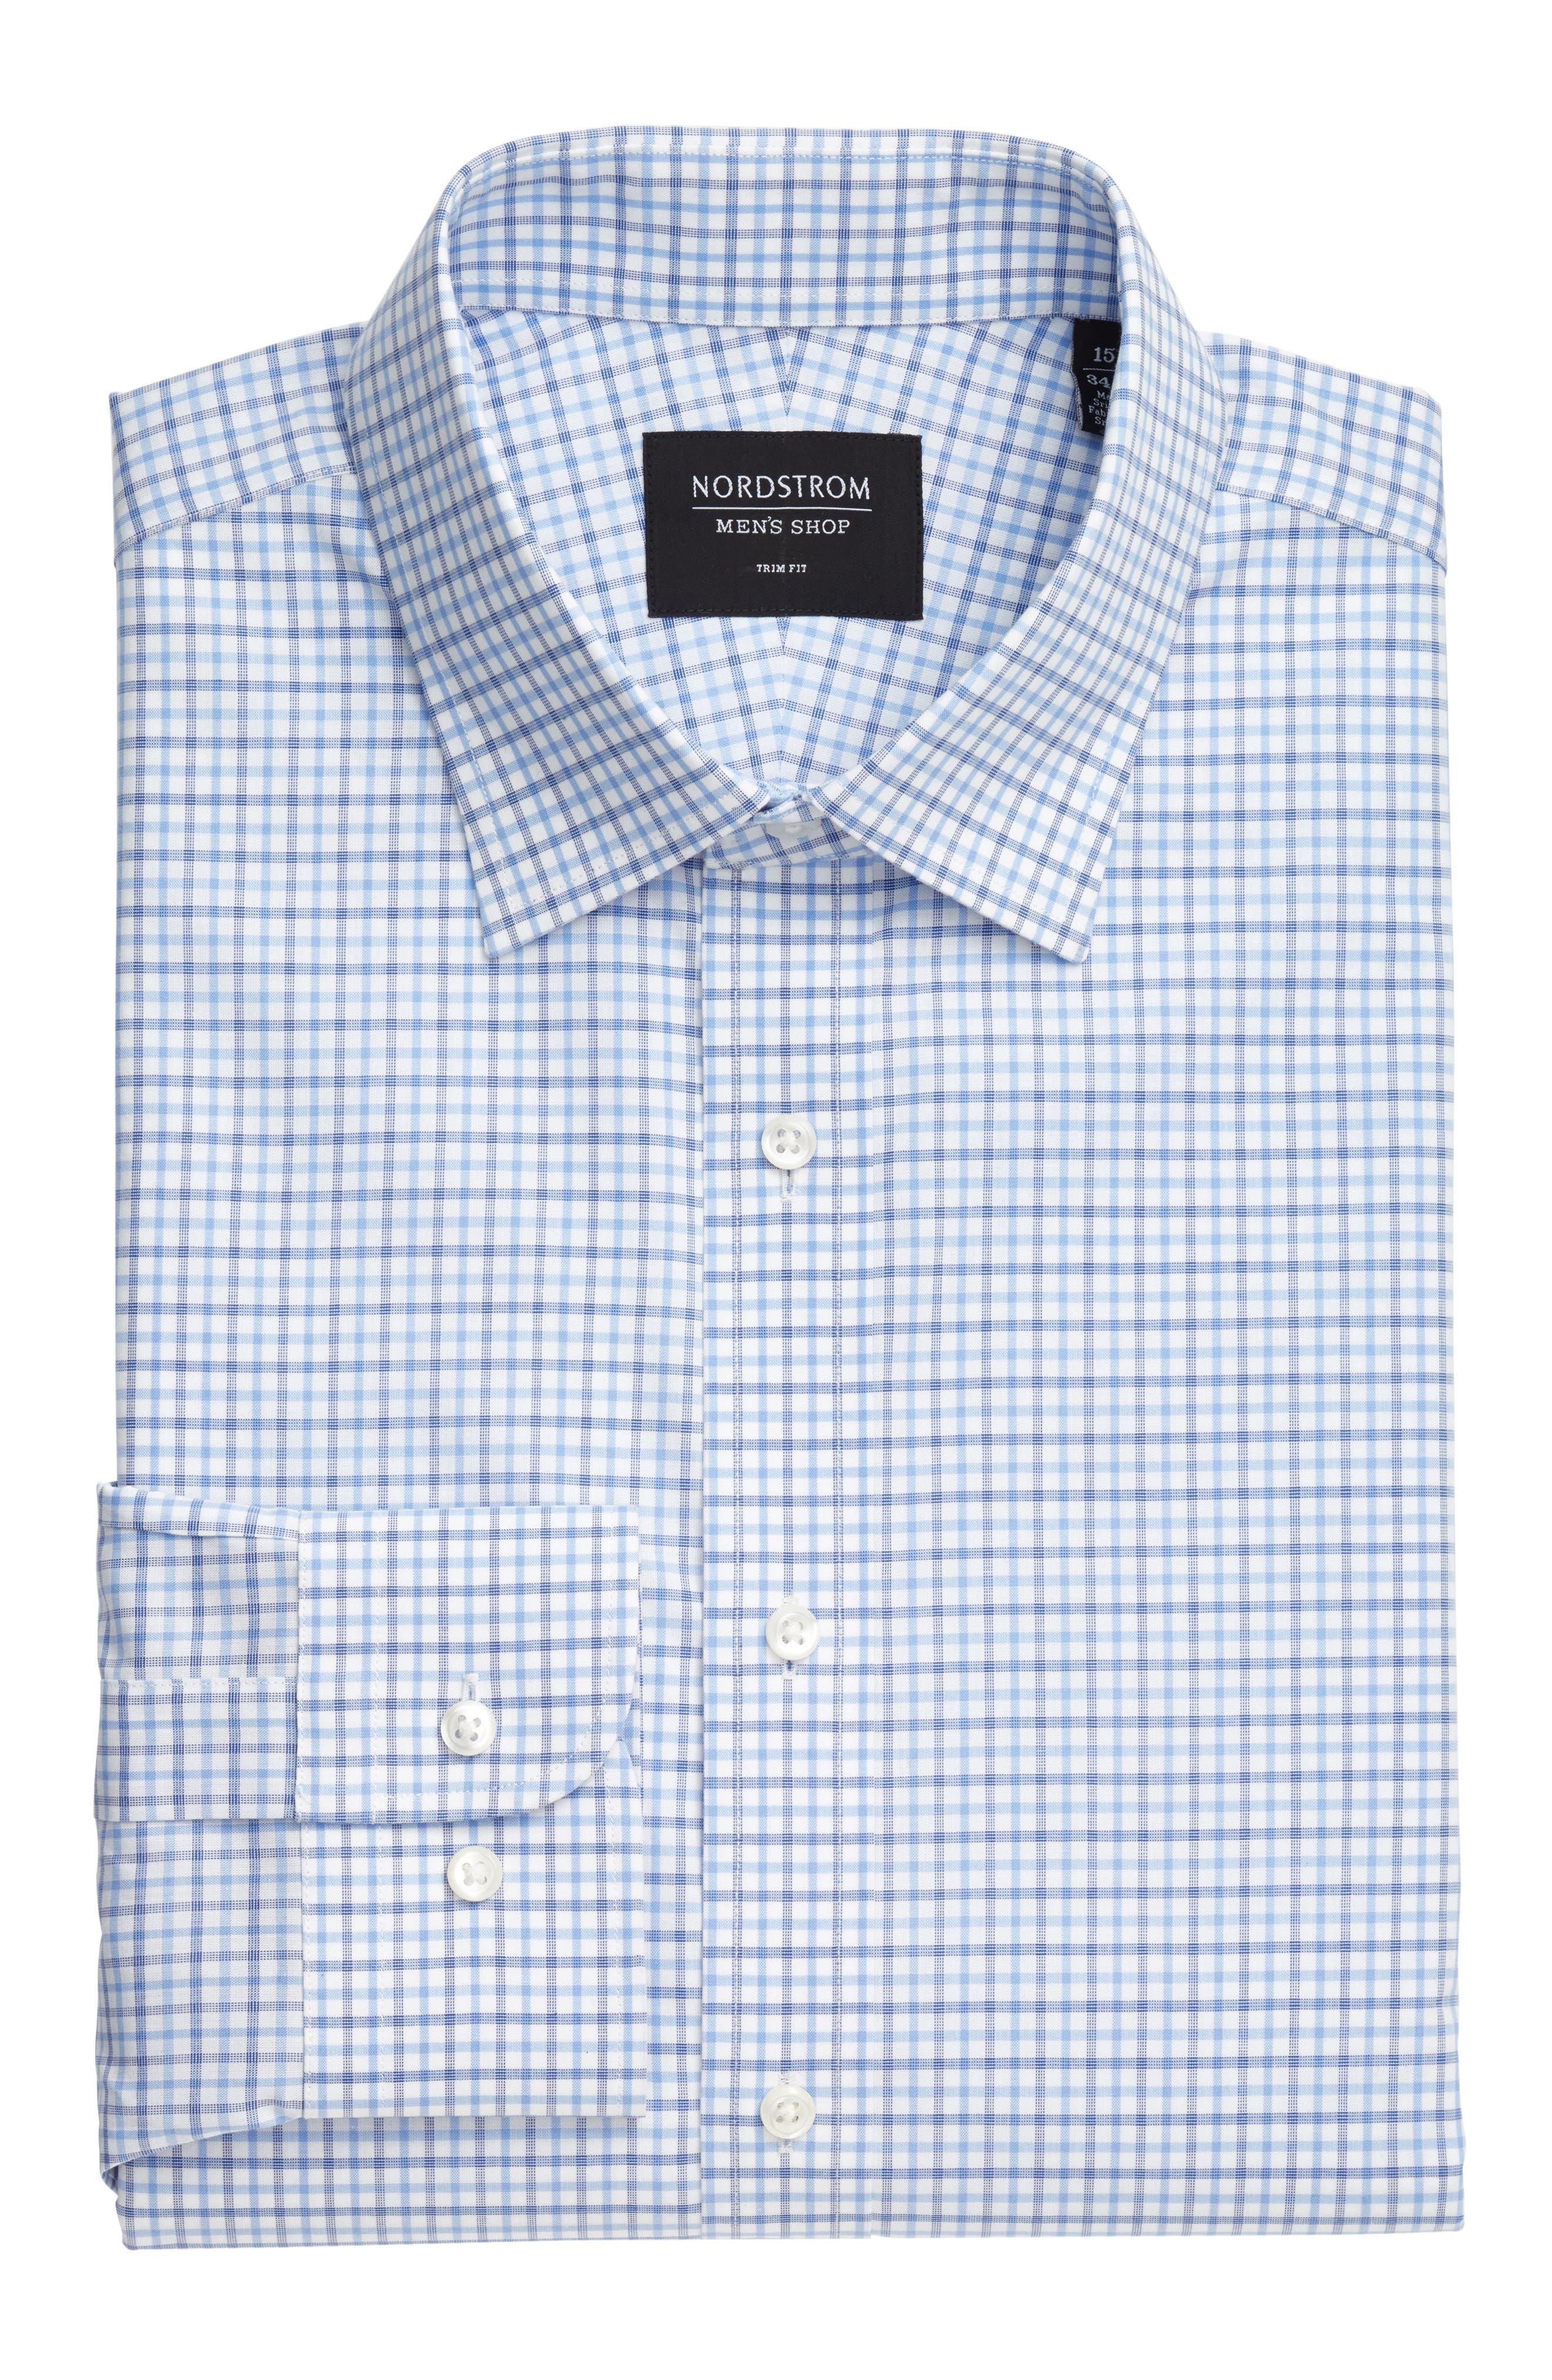 Classic Fit Check Dress Shirt,                             Alternate thumbnail 5, color,                             Blue Marine